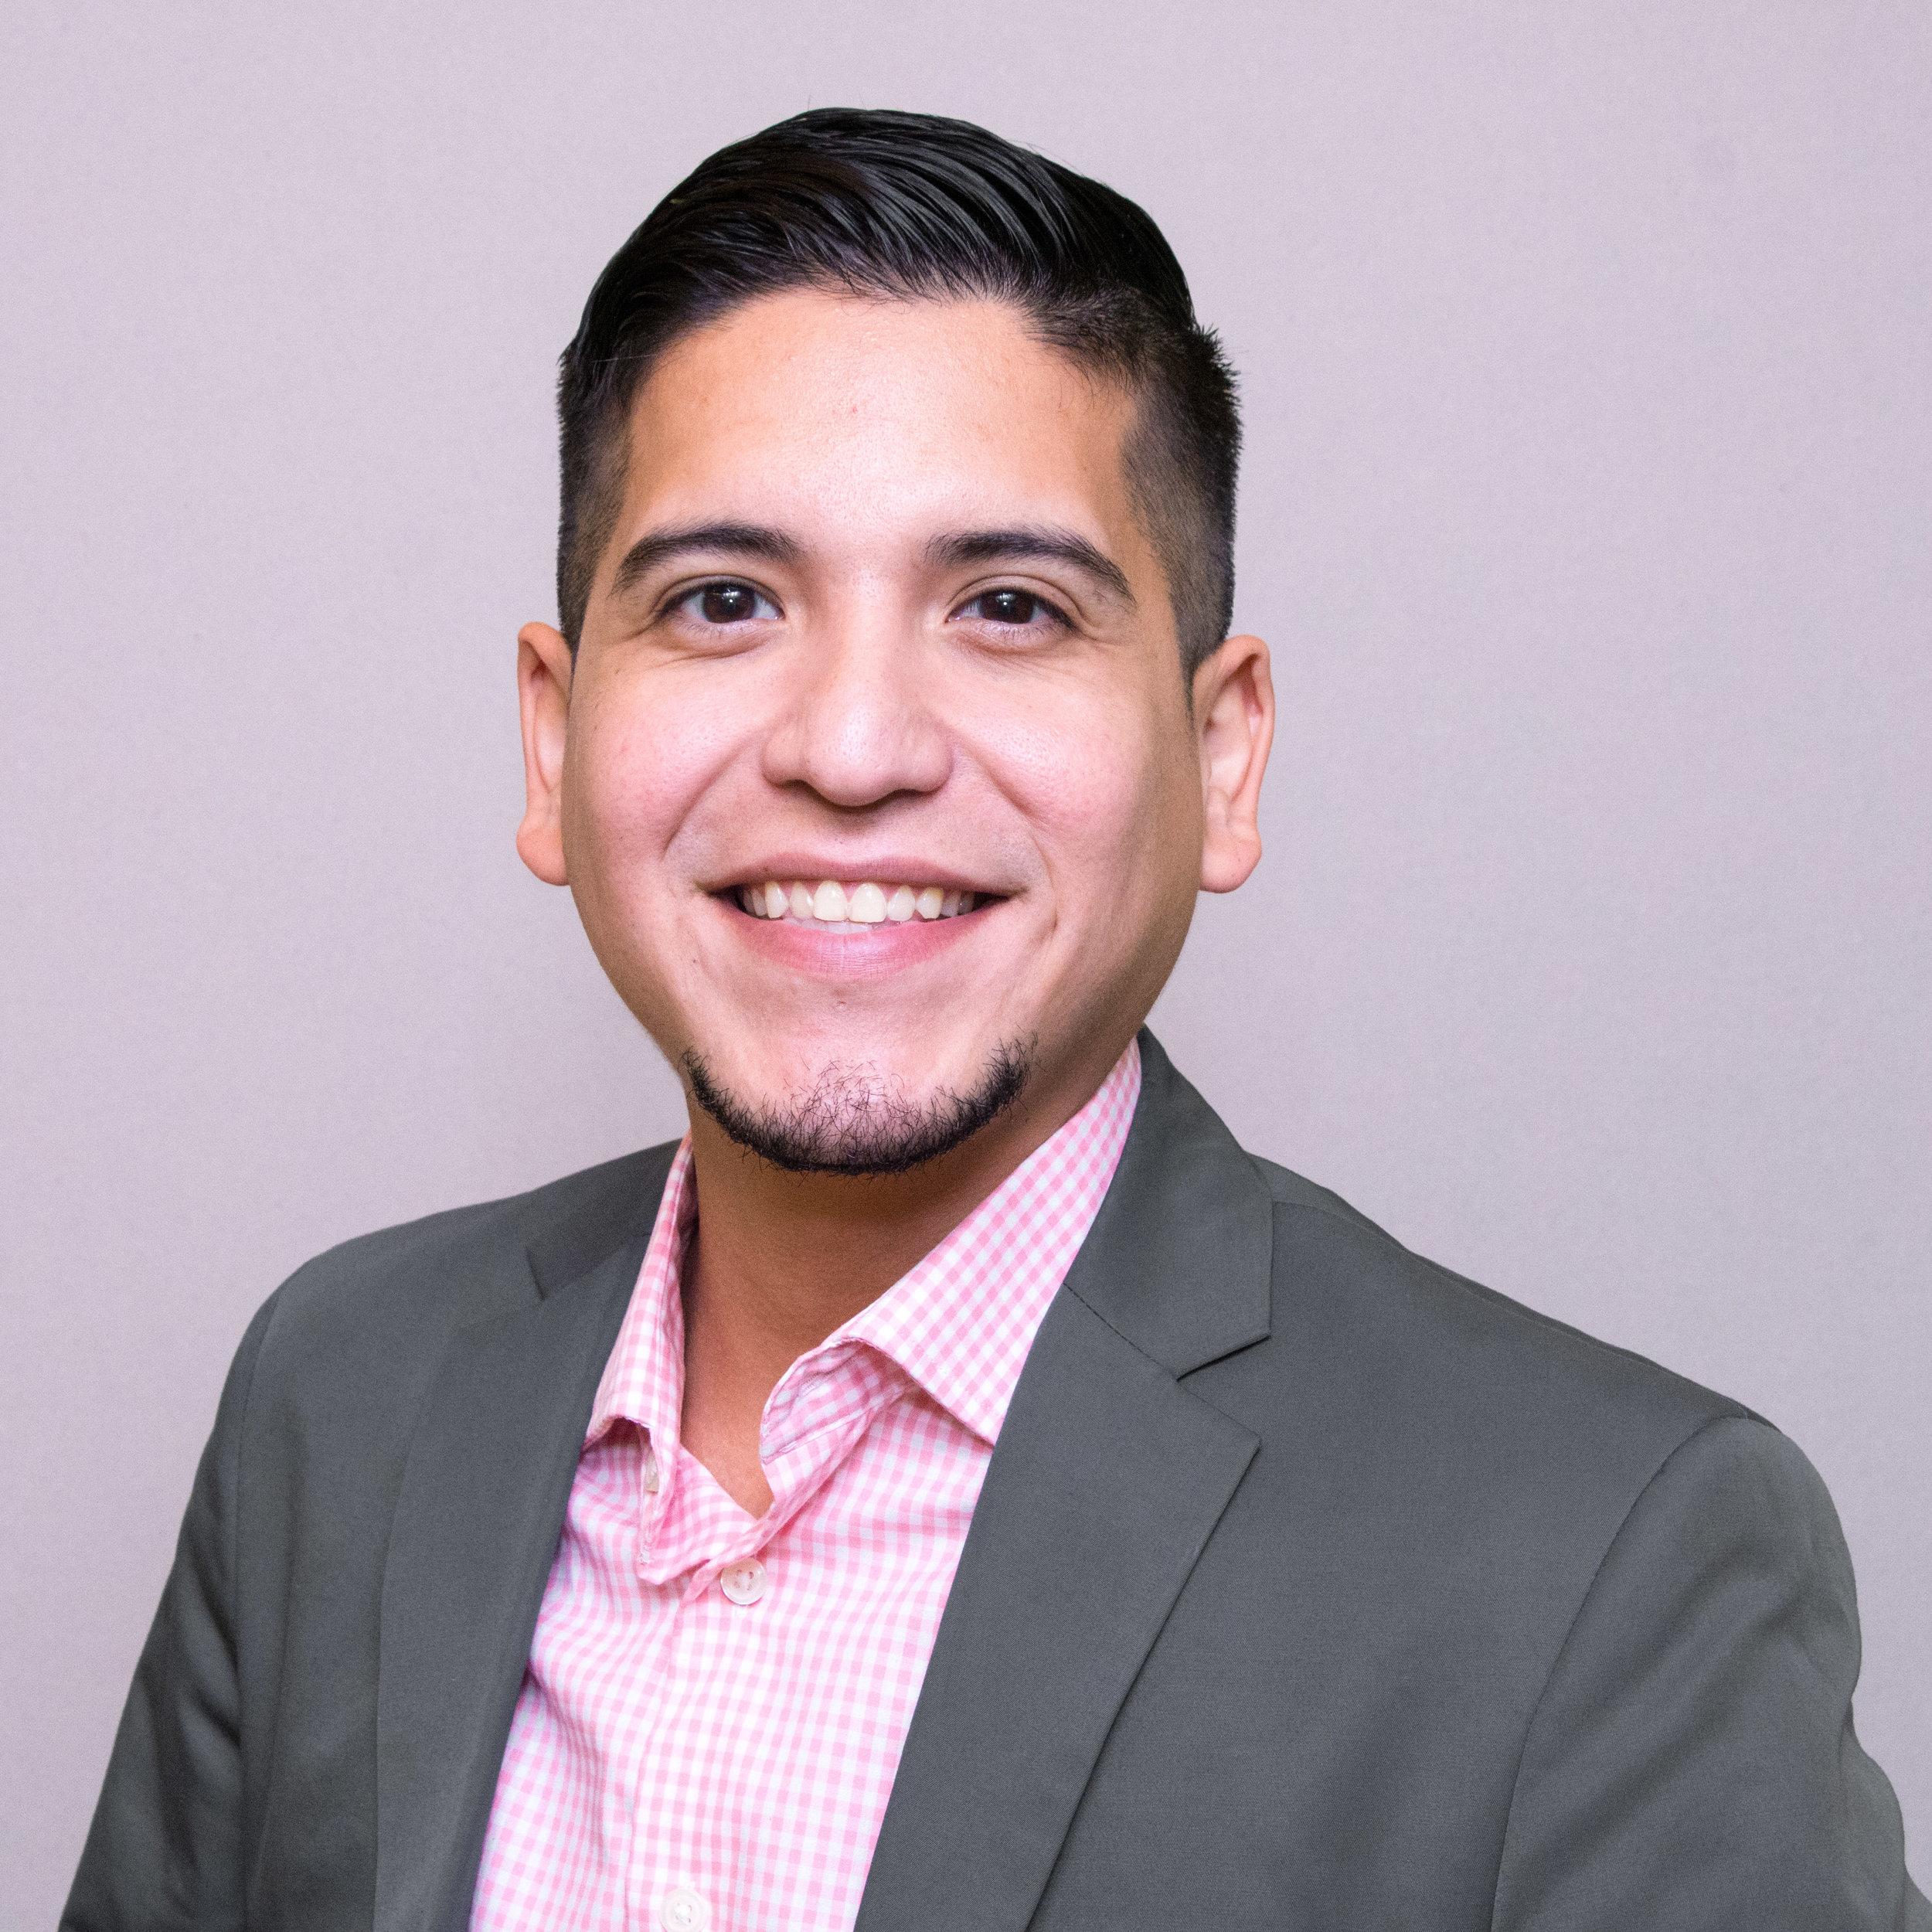 Ricardo Rodriguez, Manager, Greater Houston Programs, Latinos for Education